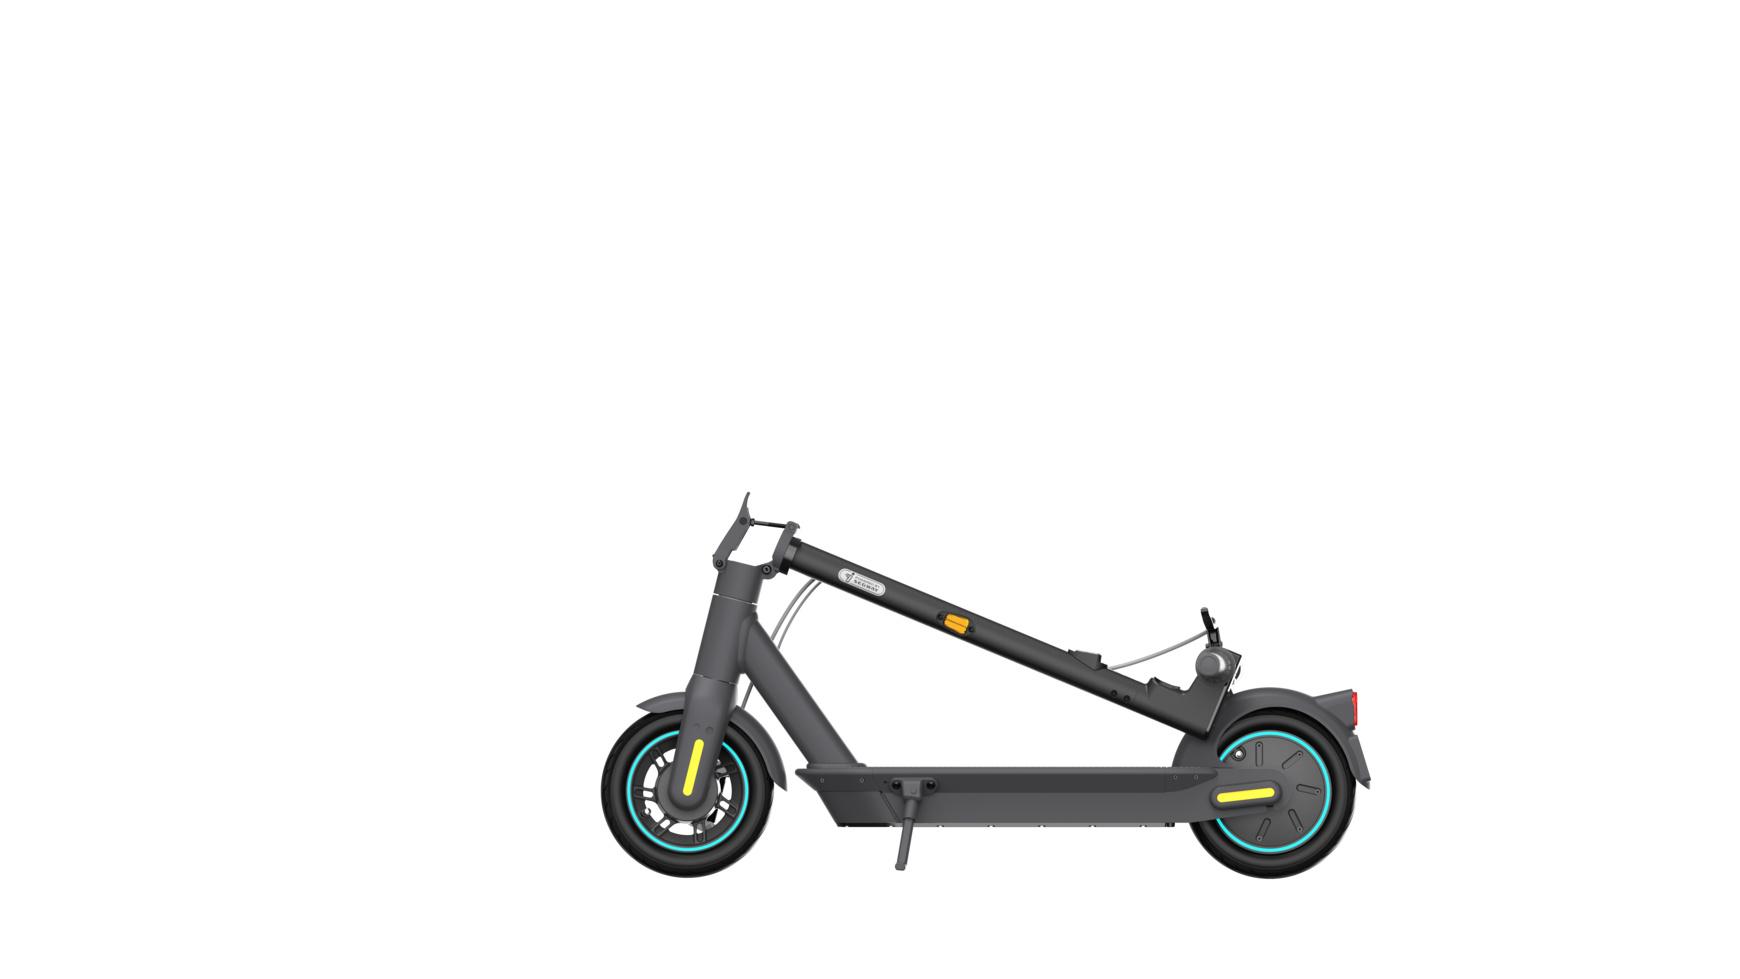 eScooter Segway Ninebot G30D geklappt